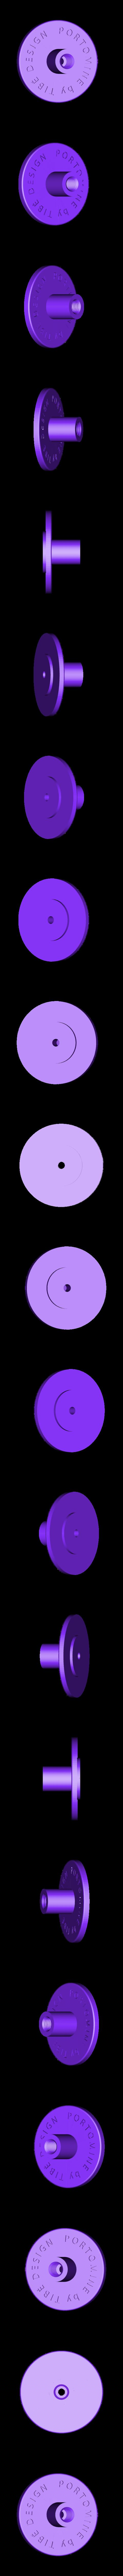 portomine_support_fixation01.STL Download free STL file Portomine lozenge hook • 3D print template, Tibe-Design